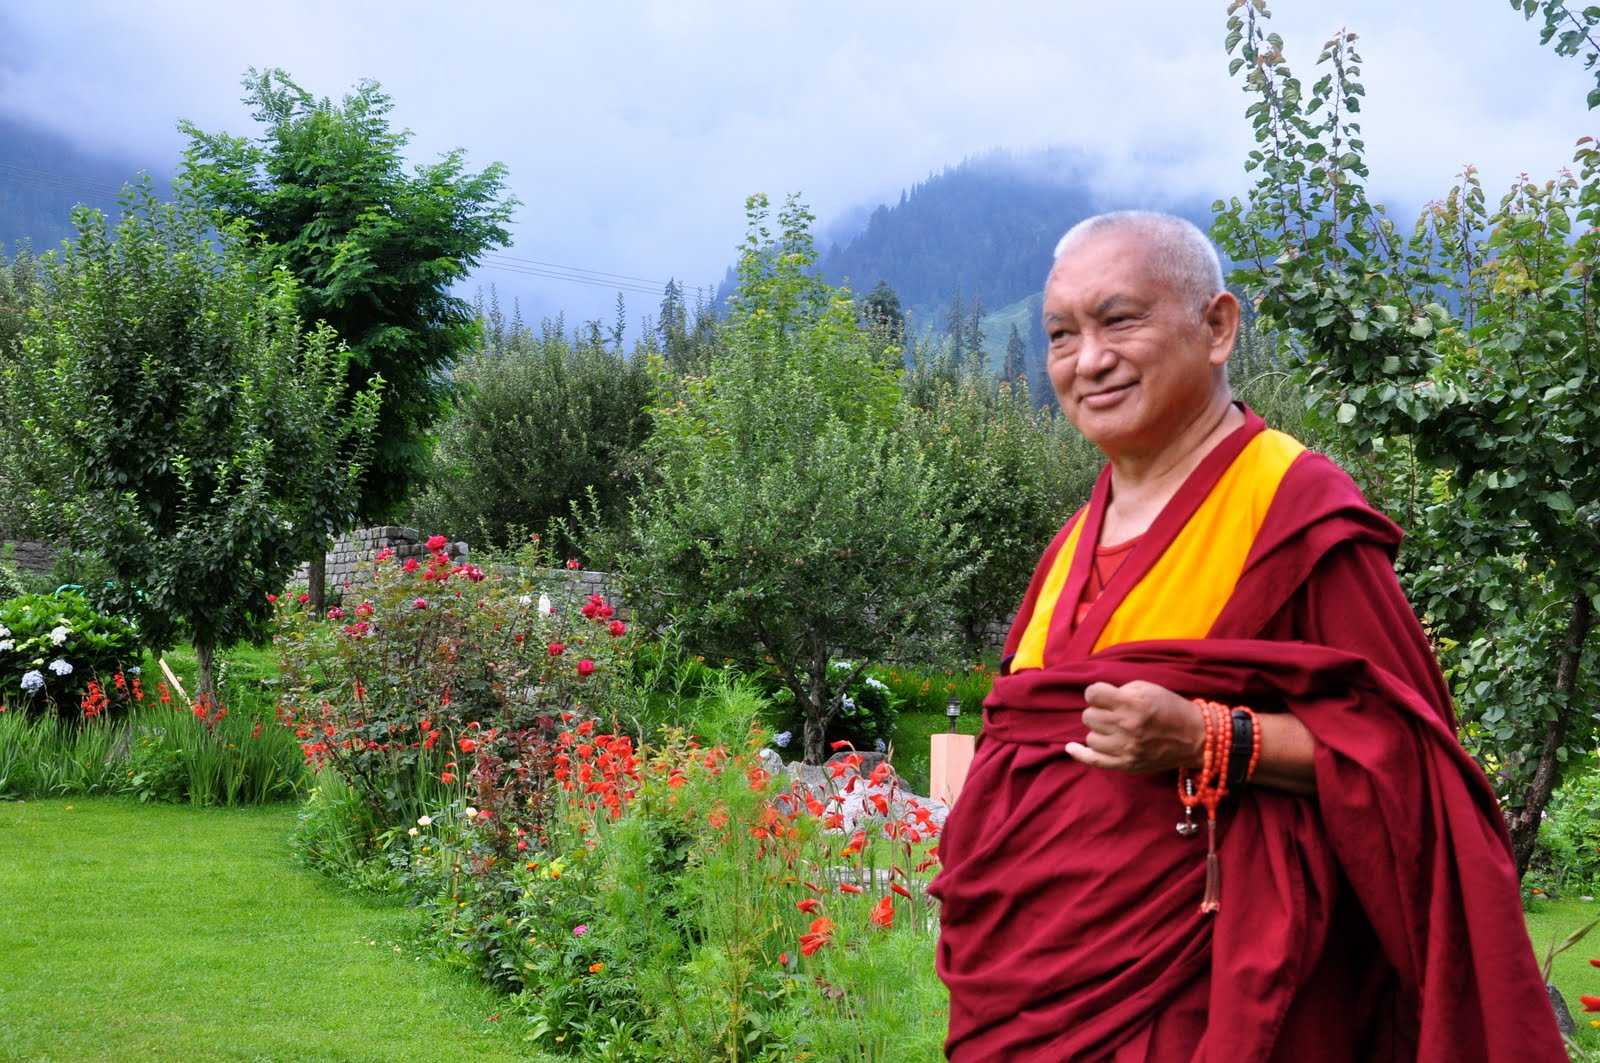 Rinpoche in Manali, India, enjoying the gardens. July, 2013. Photo Ven. Sarah Thresher.